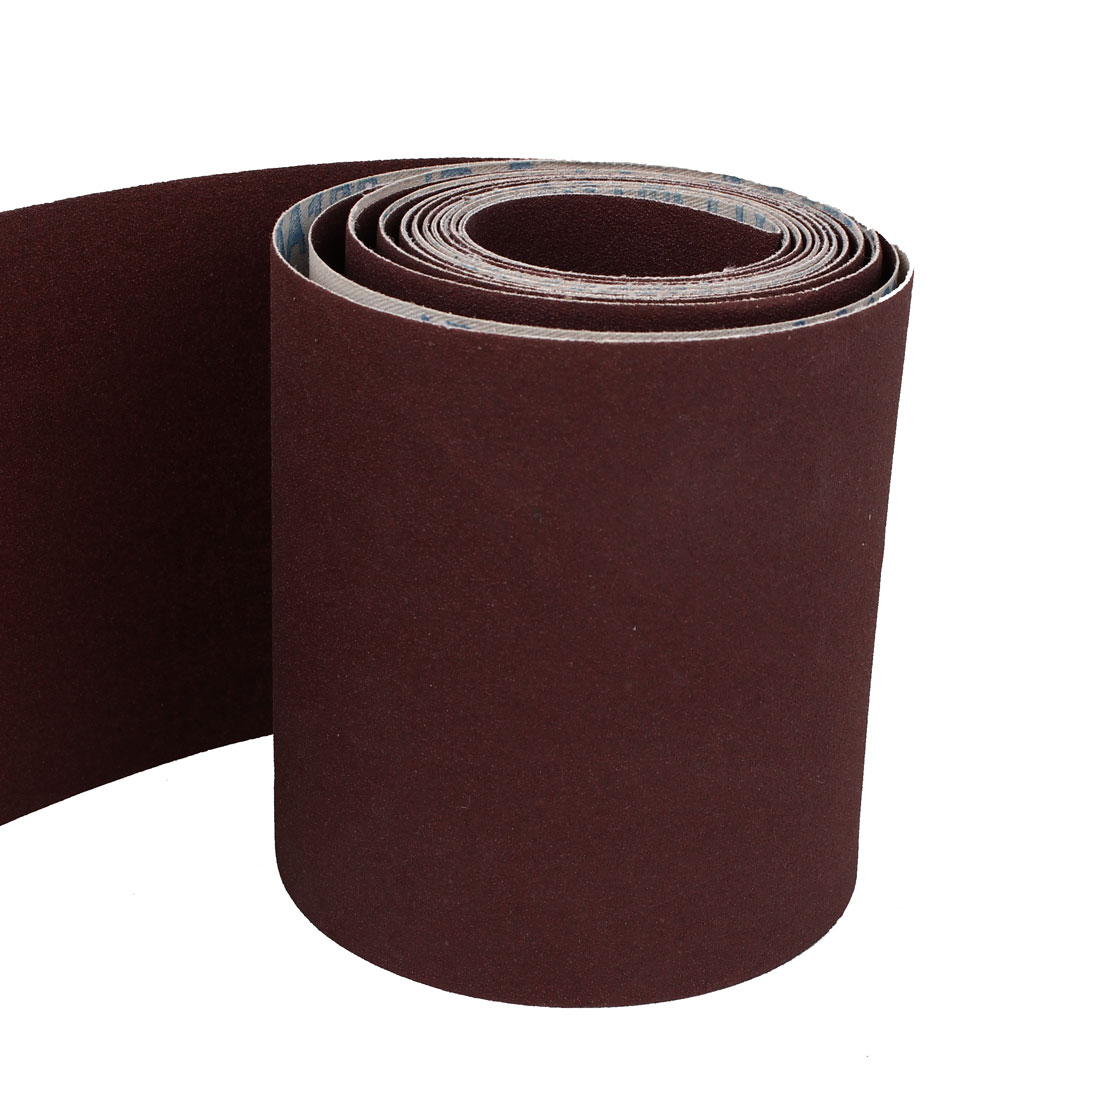 5M Long 115mm Width 180 Grit Abrasive Sanding Sand Paper Sandpaper